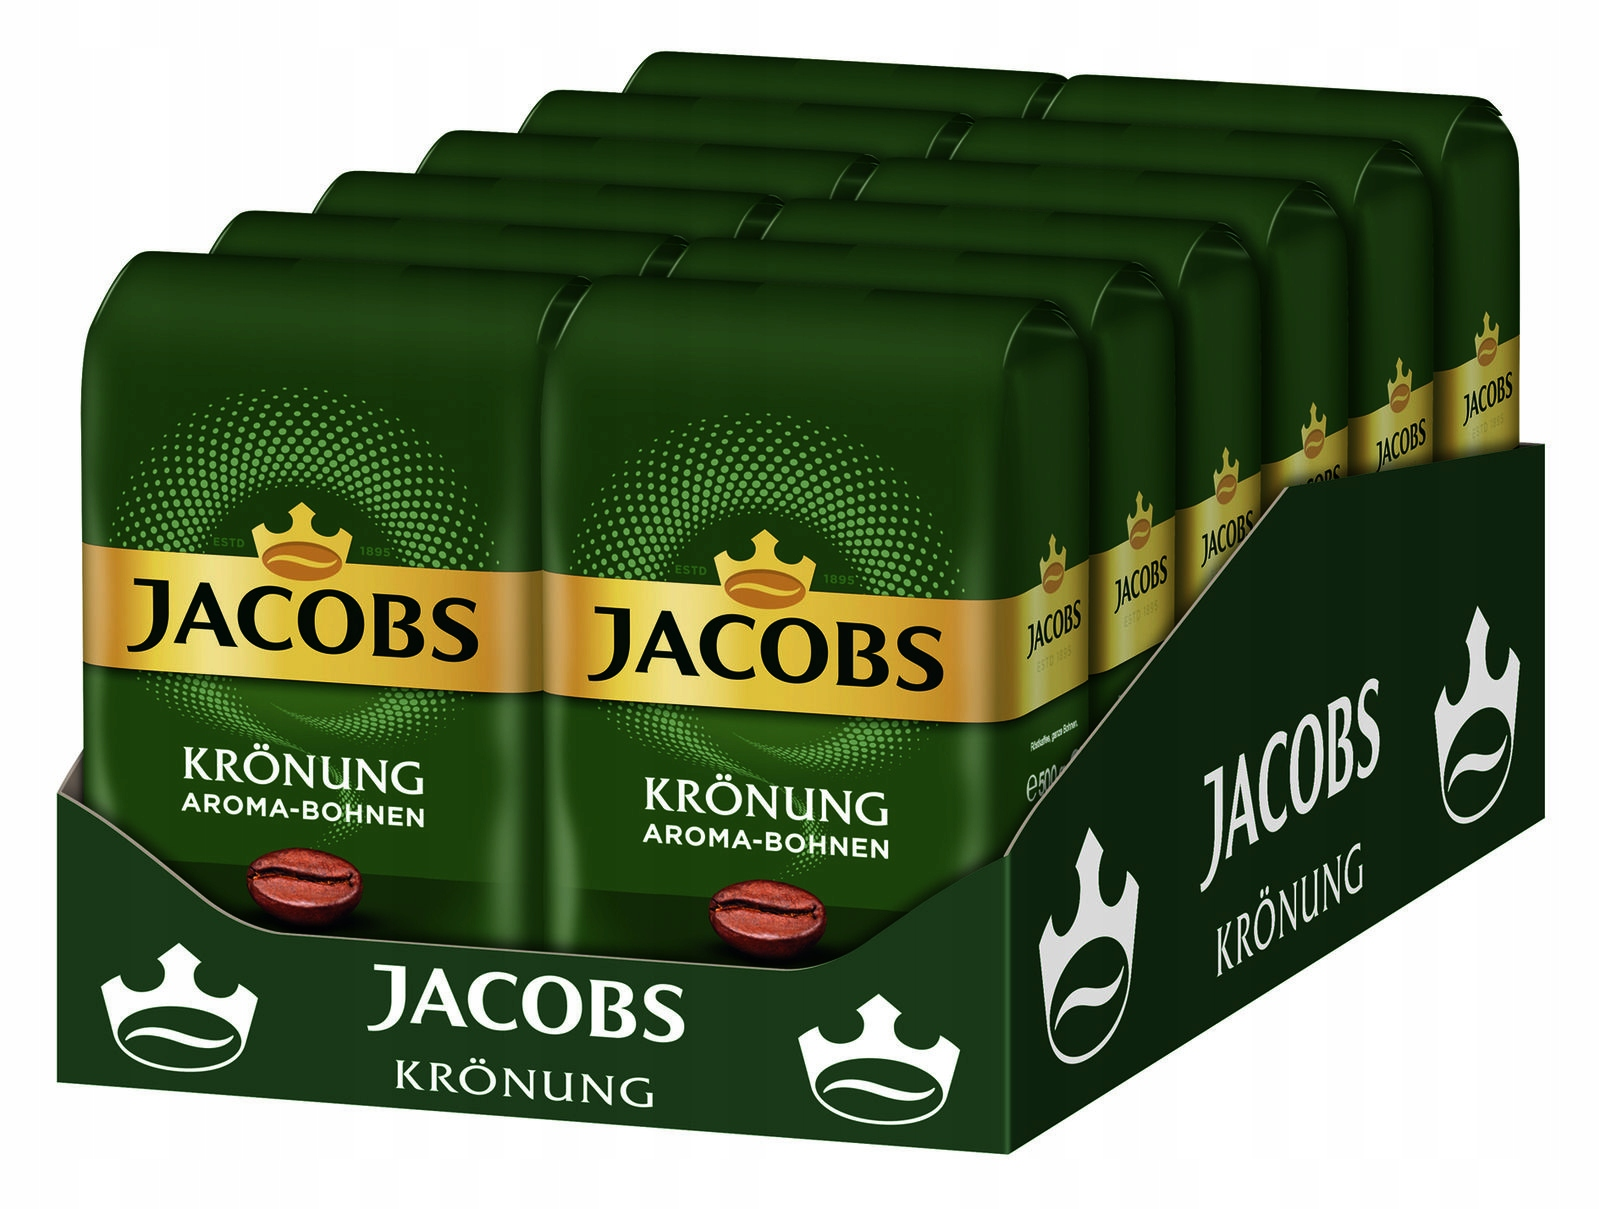 Jacobs Kronung Aroma-Bohnen ziarno box 12x500g=6kg